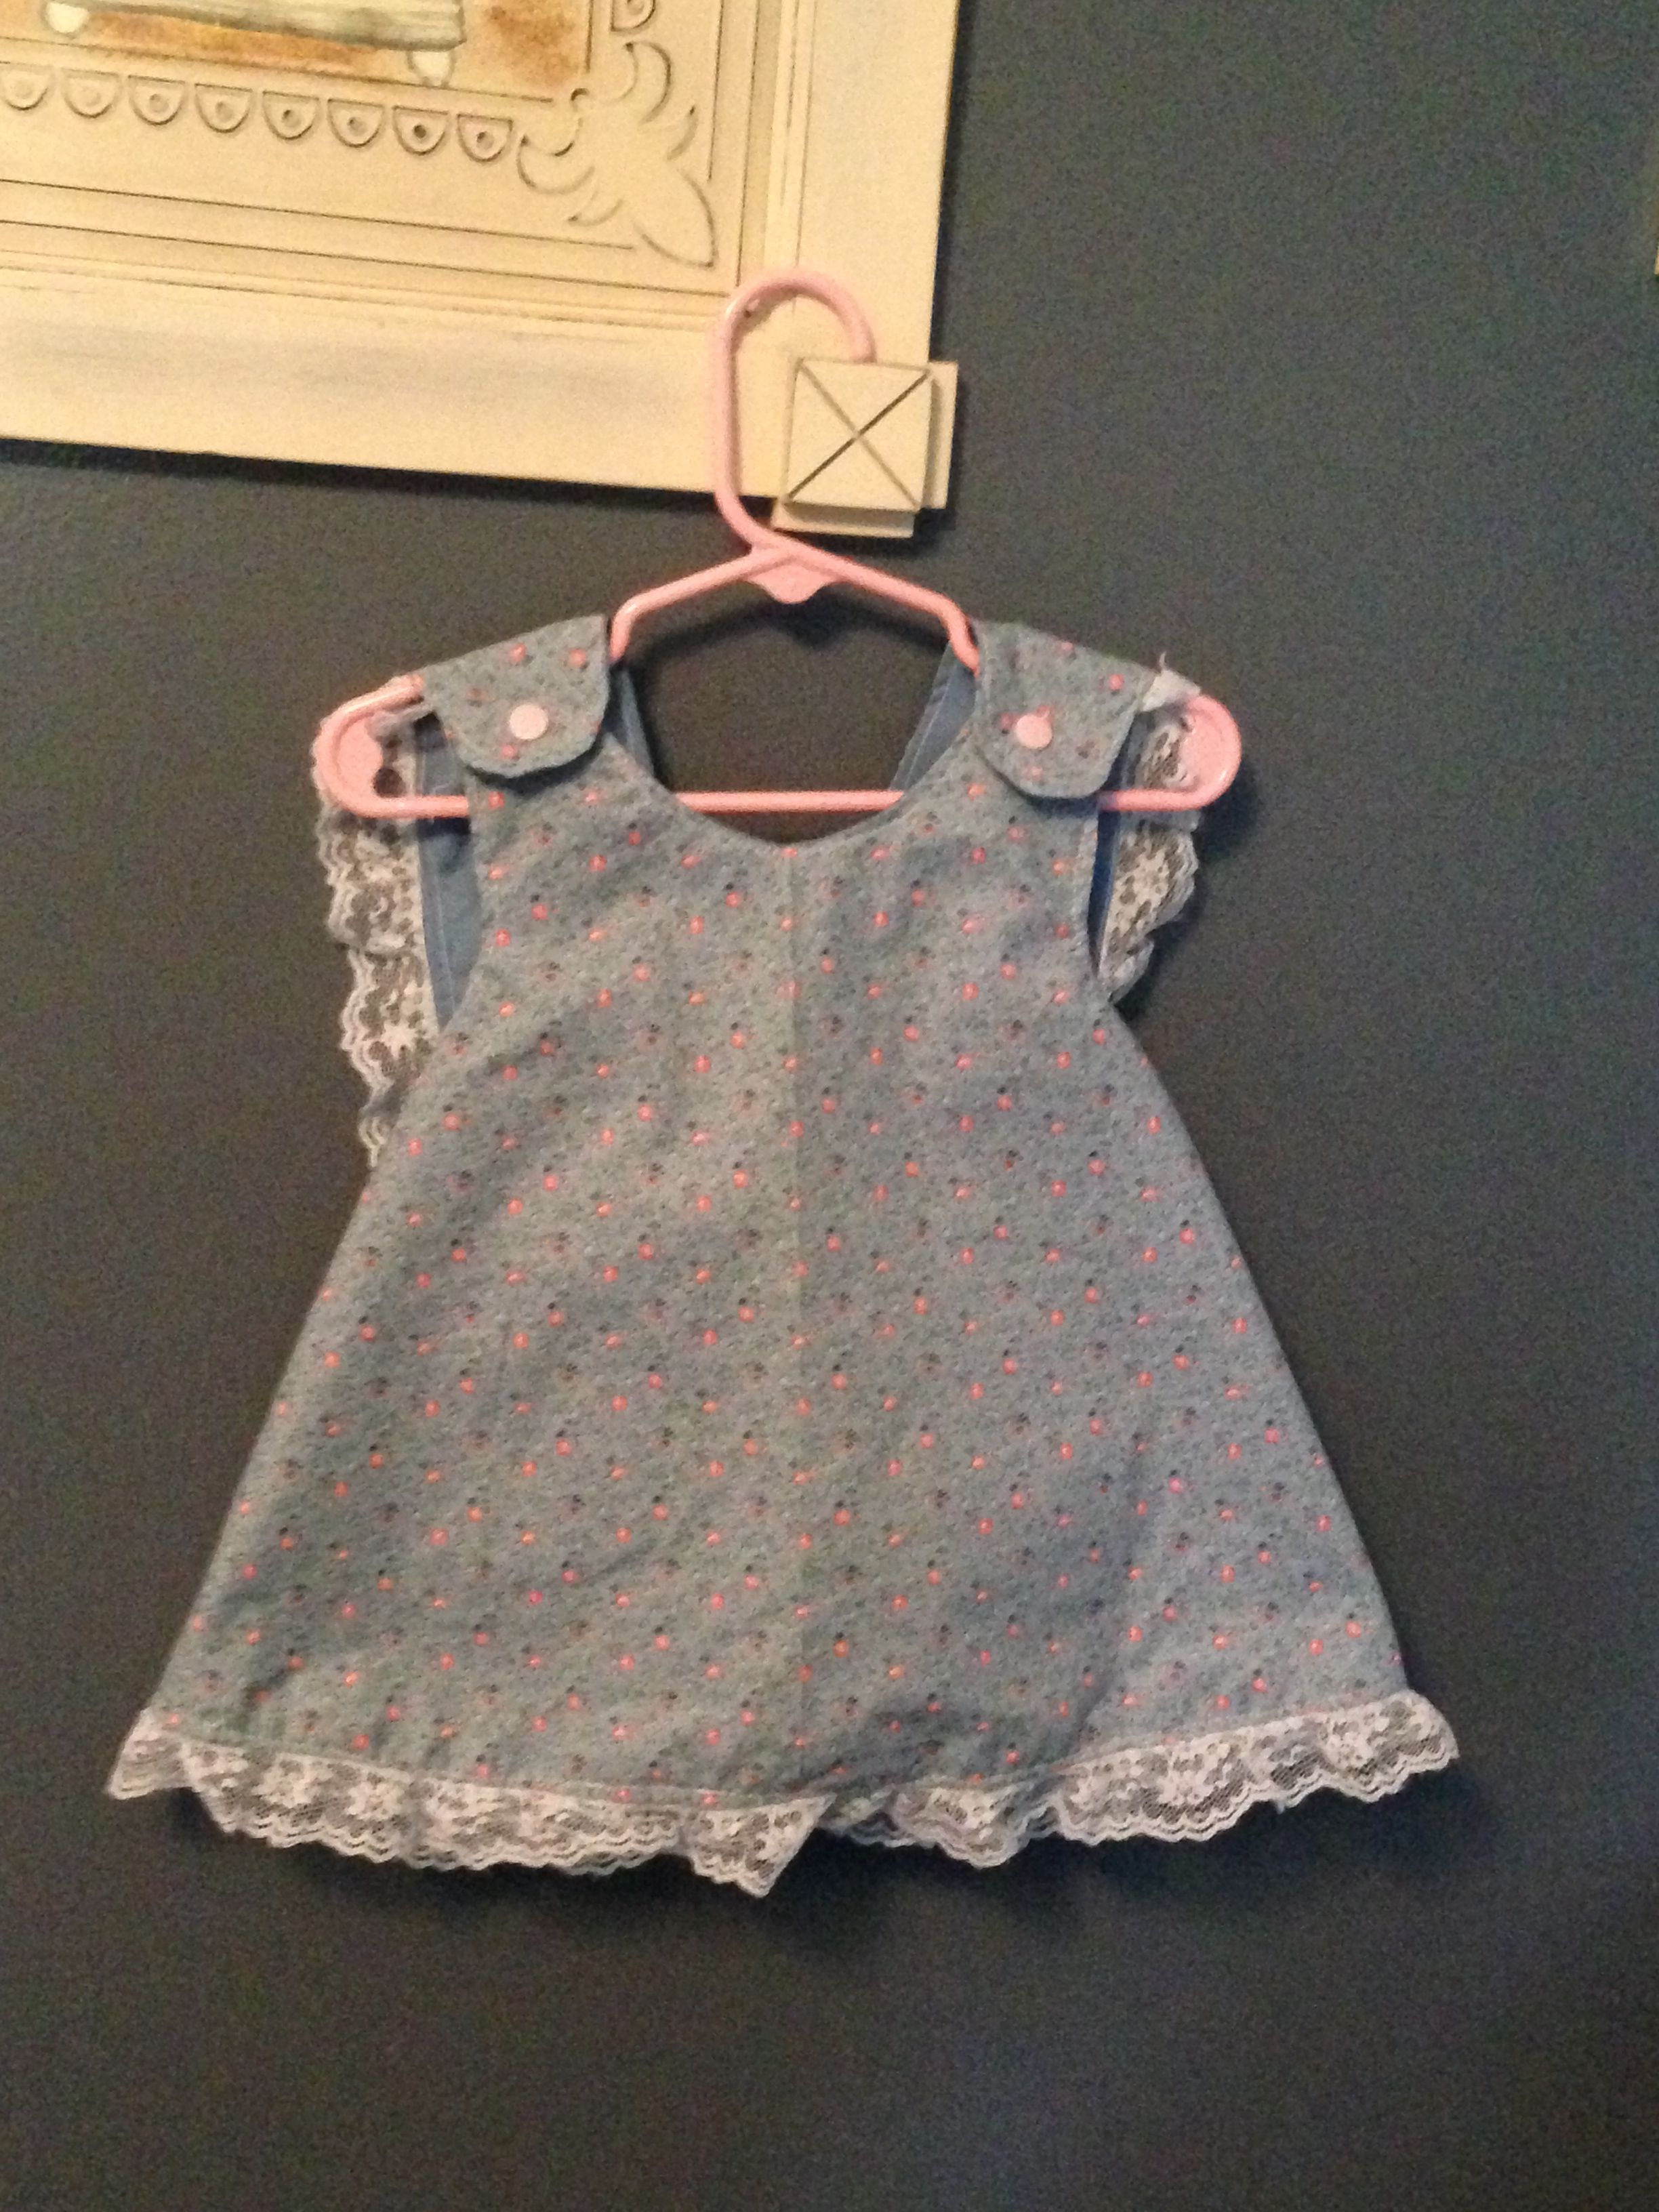 336dca5d1d3 Affordable toddler clothes for summer